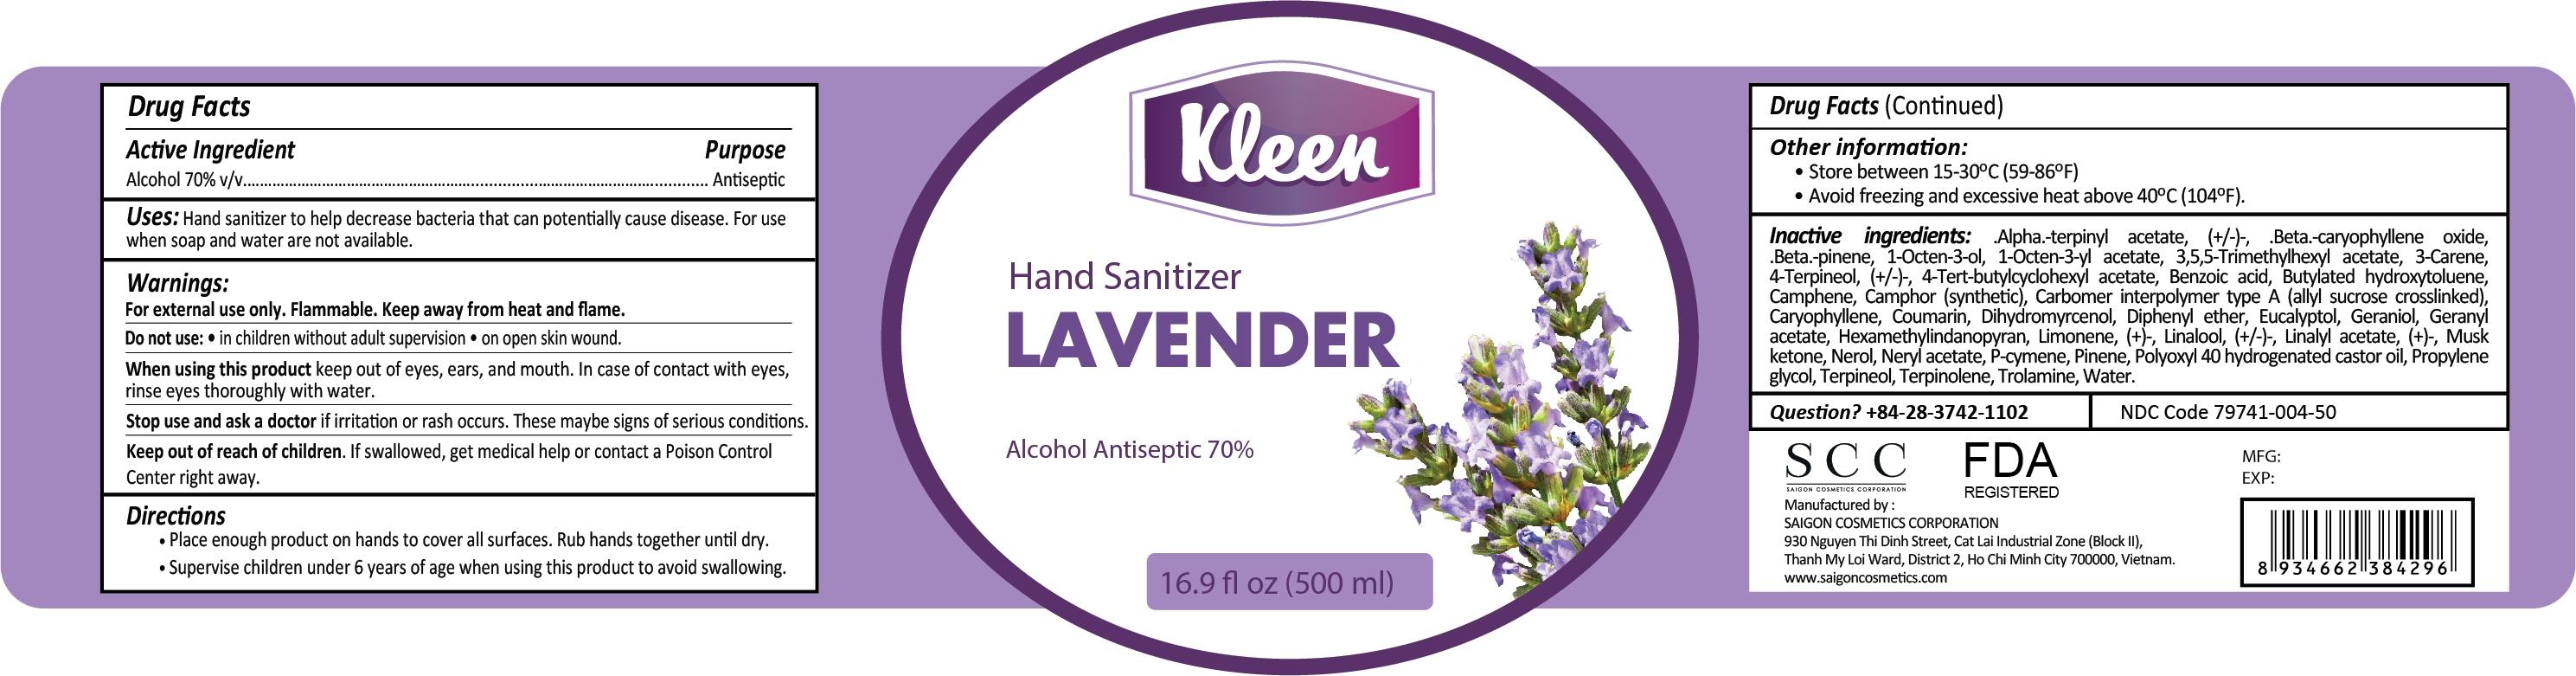 Kleen Hand Sanitizer Lavender 500ml Label